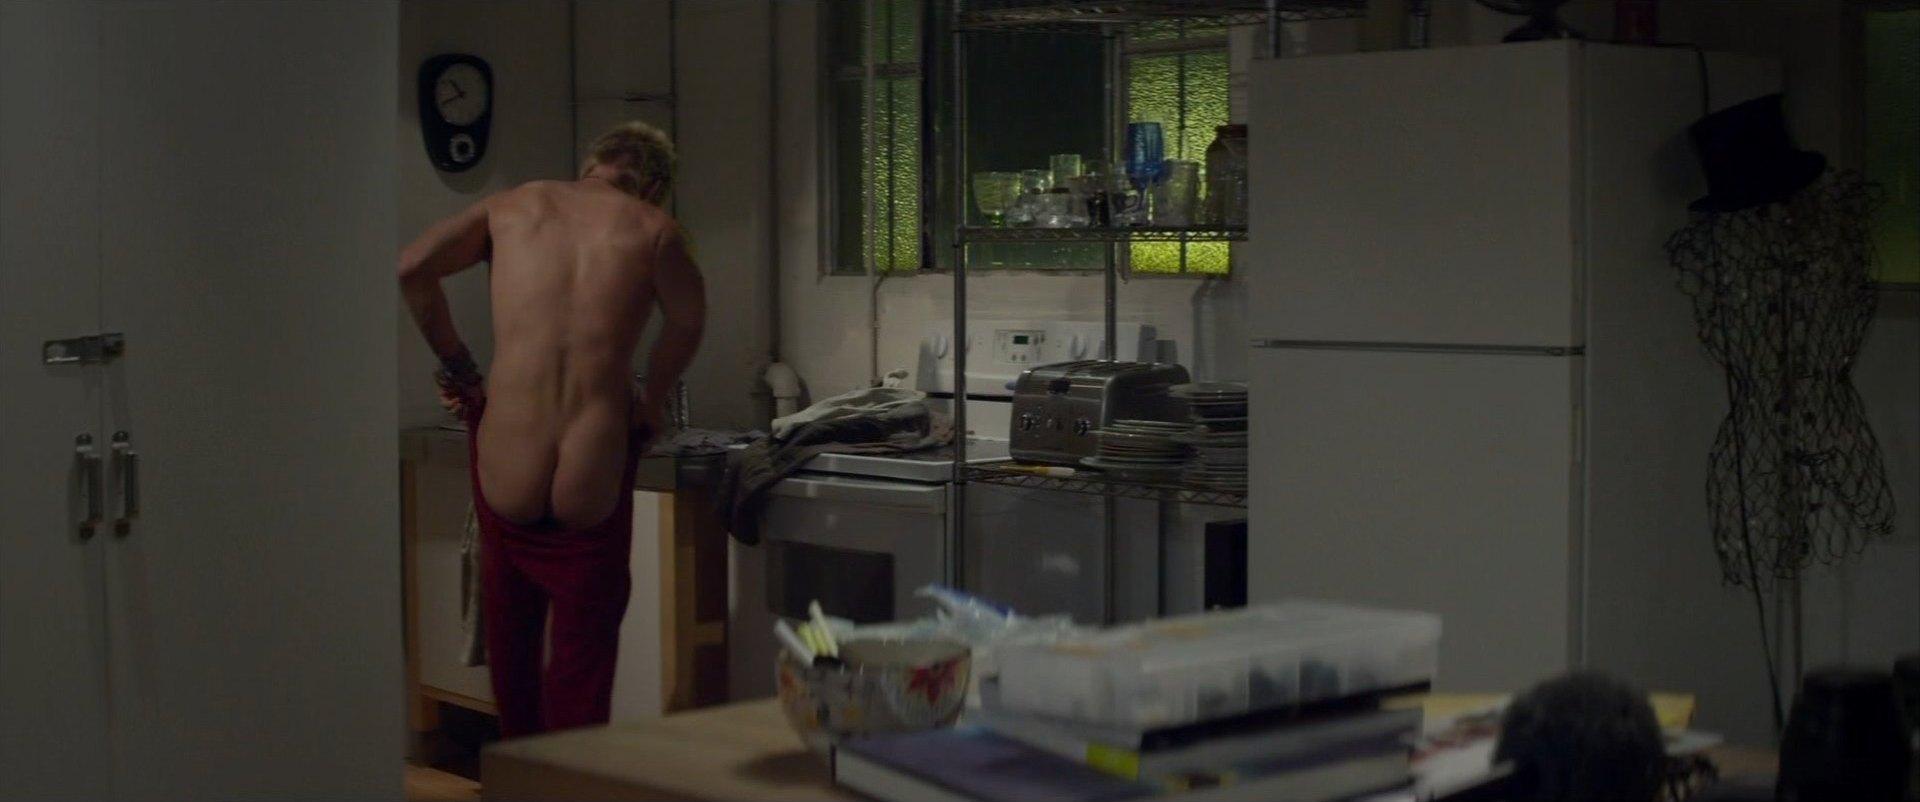 Naked chad michael murray pics